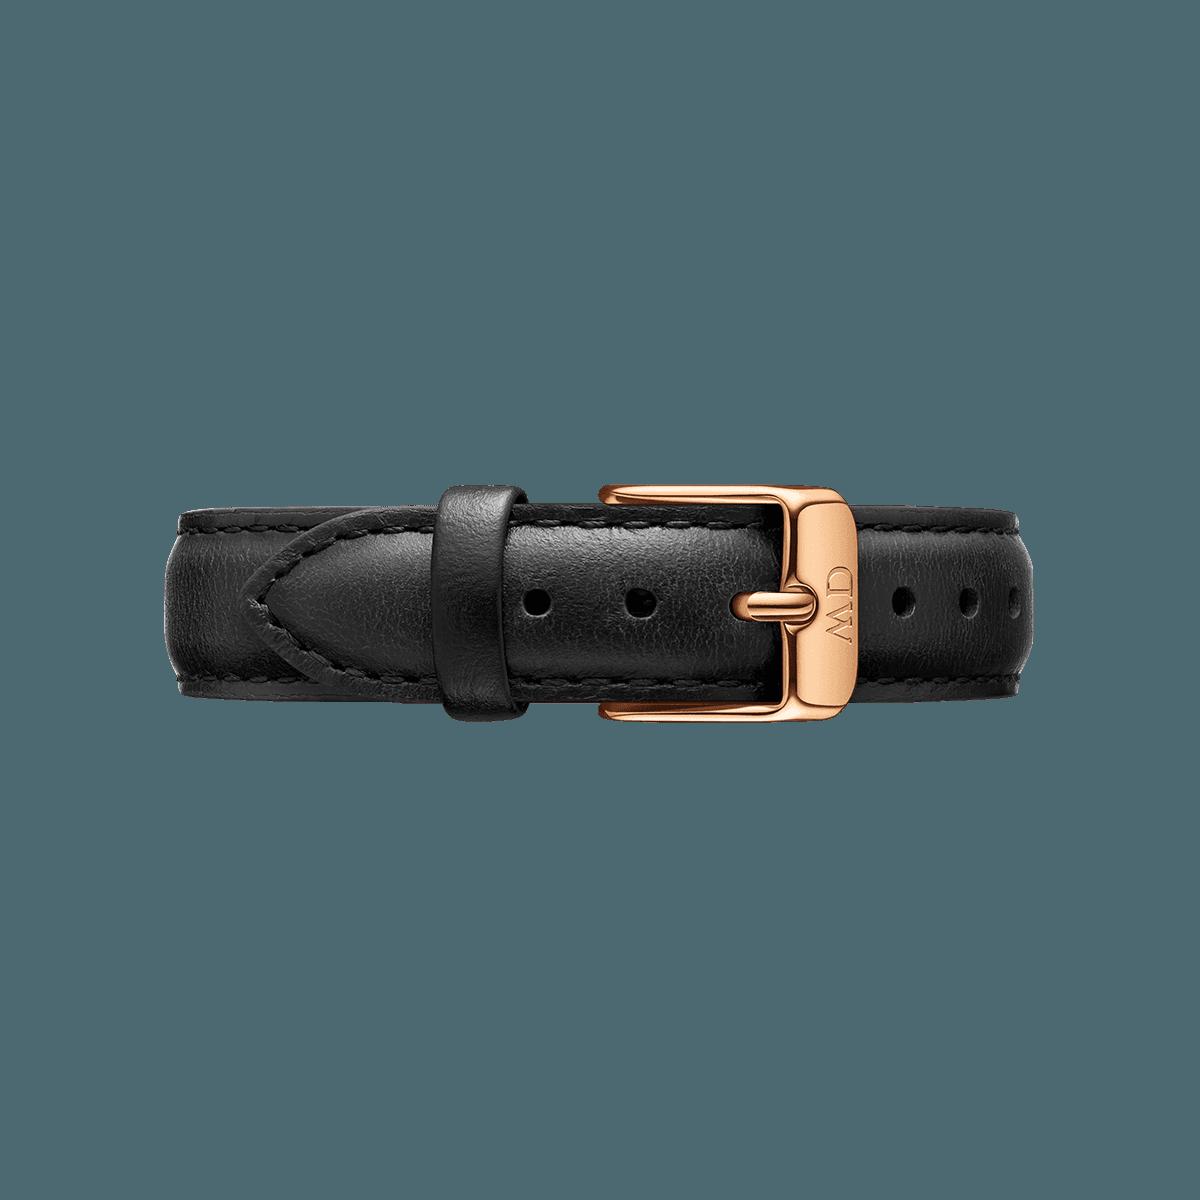 dw官网 dw手表官网 dw中国官网 dw官方旗舰店 DW DW官网  Bundle W+S Petite Melrose RG 32mm+Sheffield 14mm